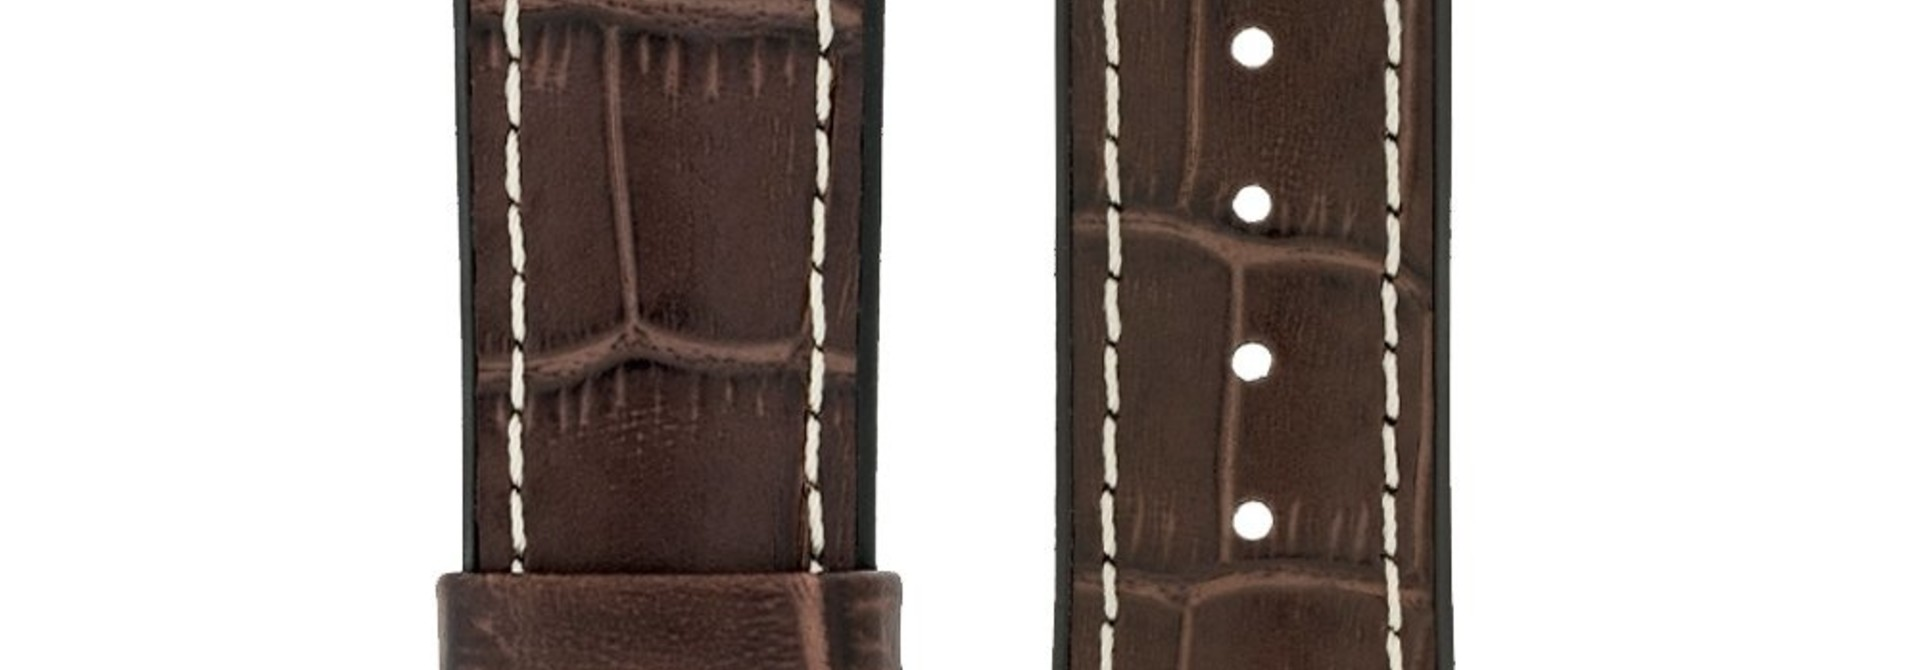 Watchband George calf leather + Premium Caoutchouc (Rubber) 20 mm